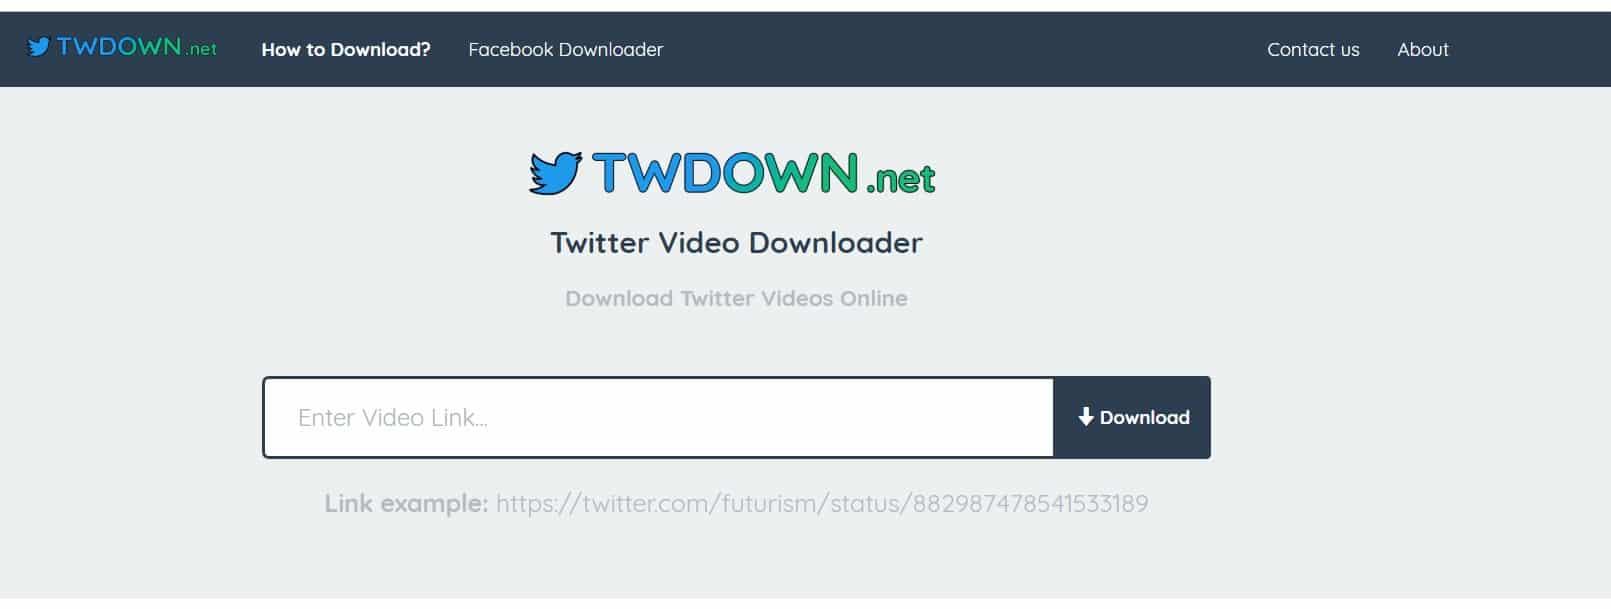 Web para bajar vídeos de Twitter